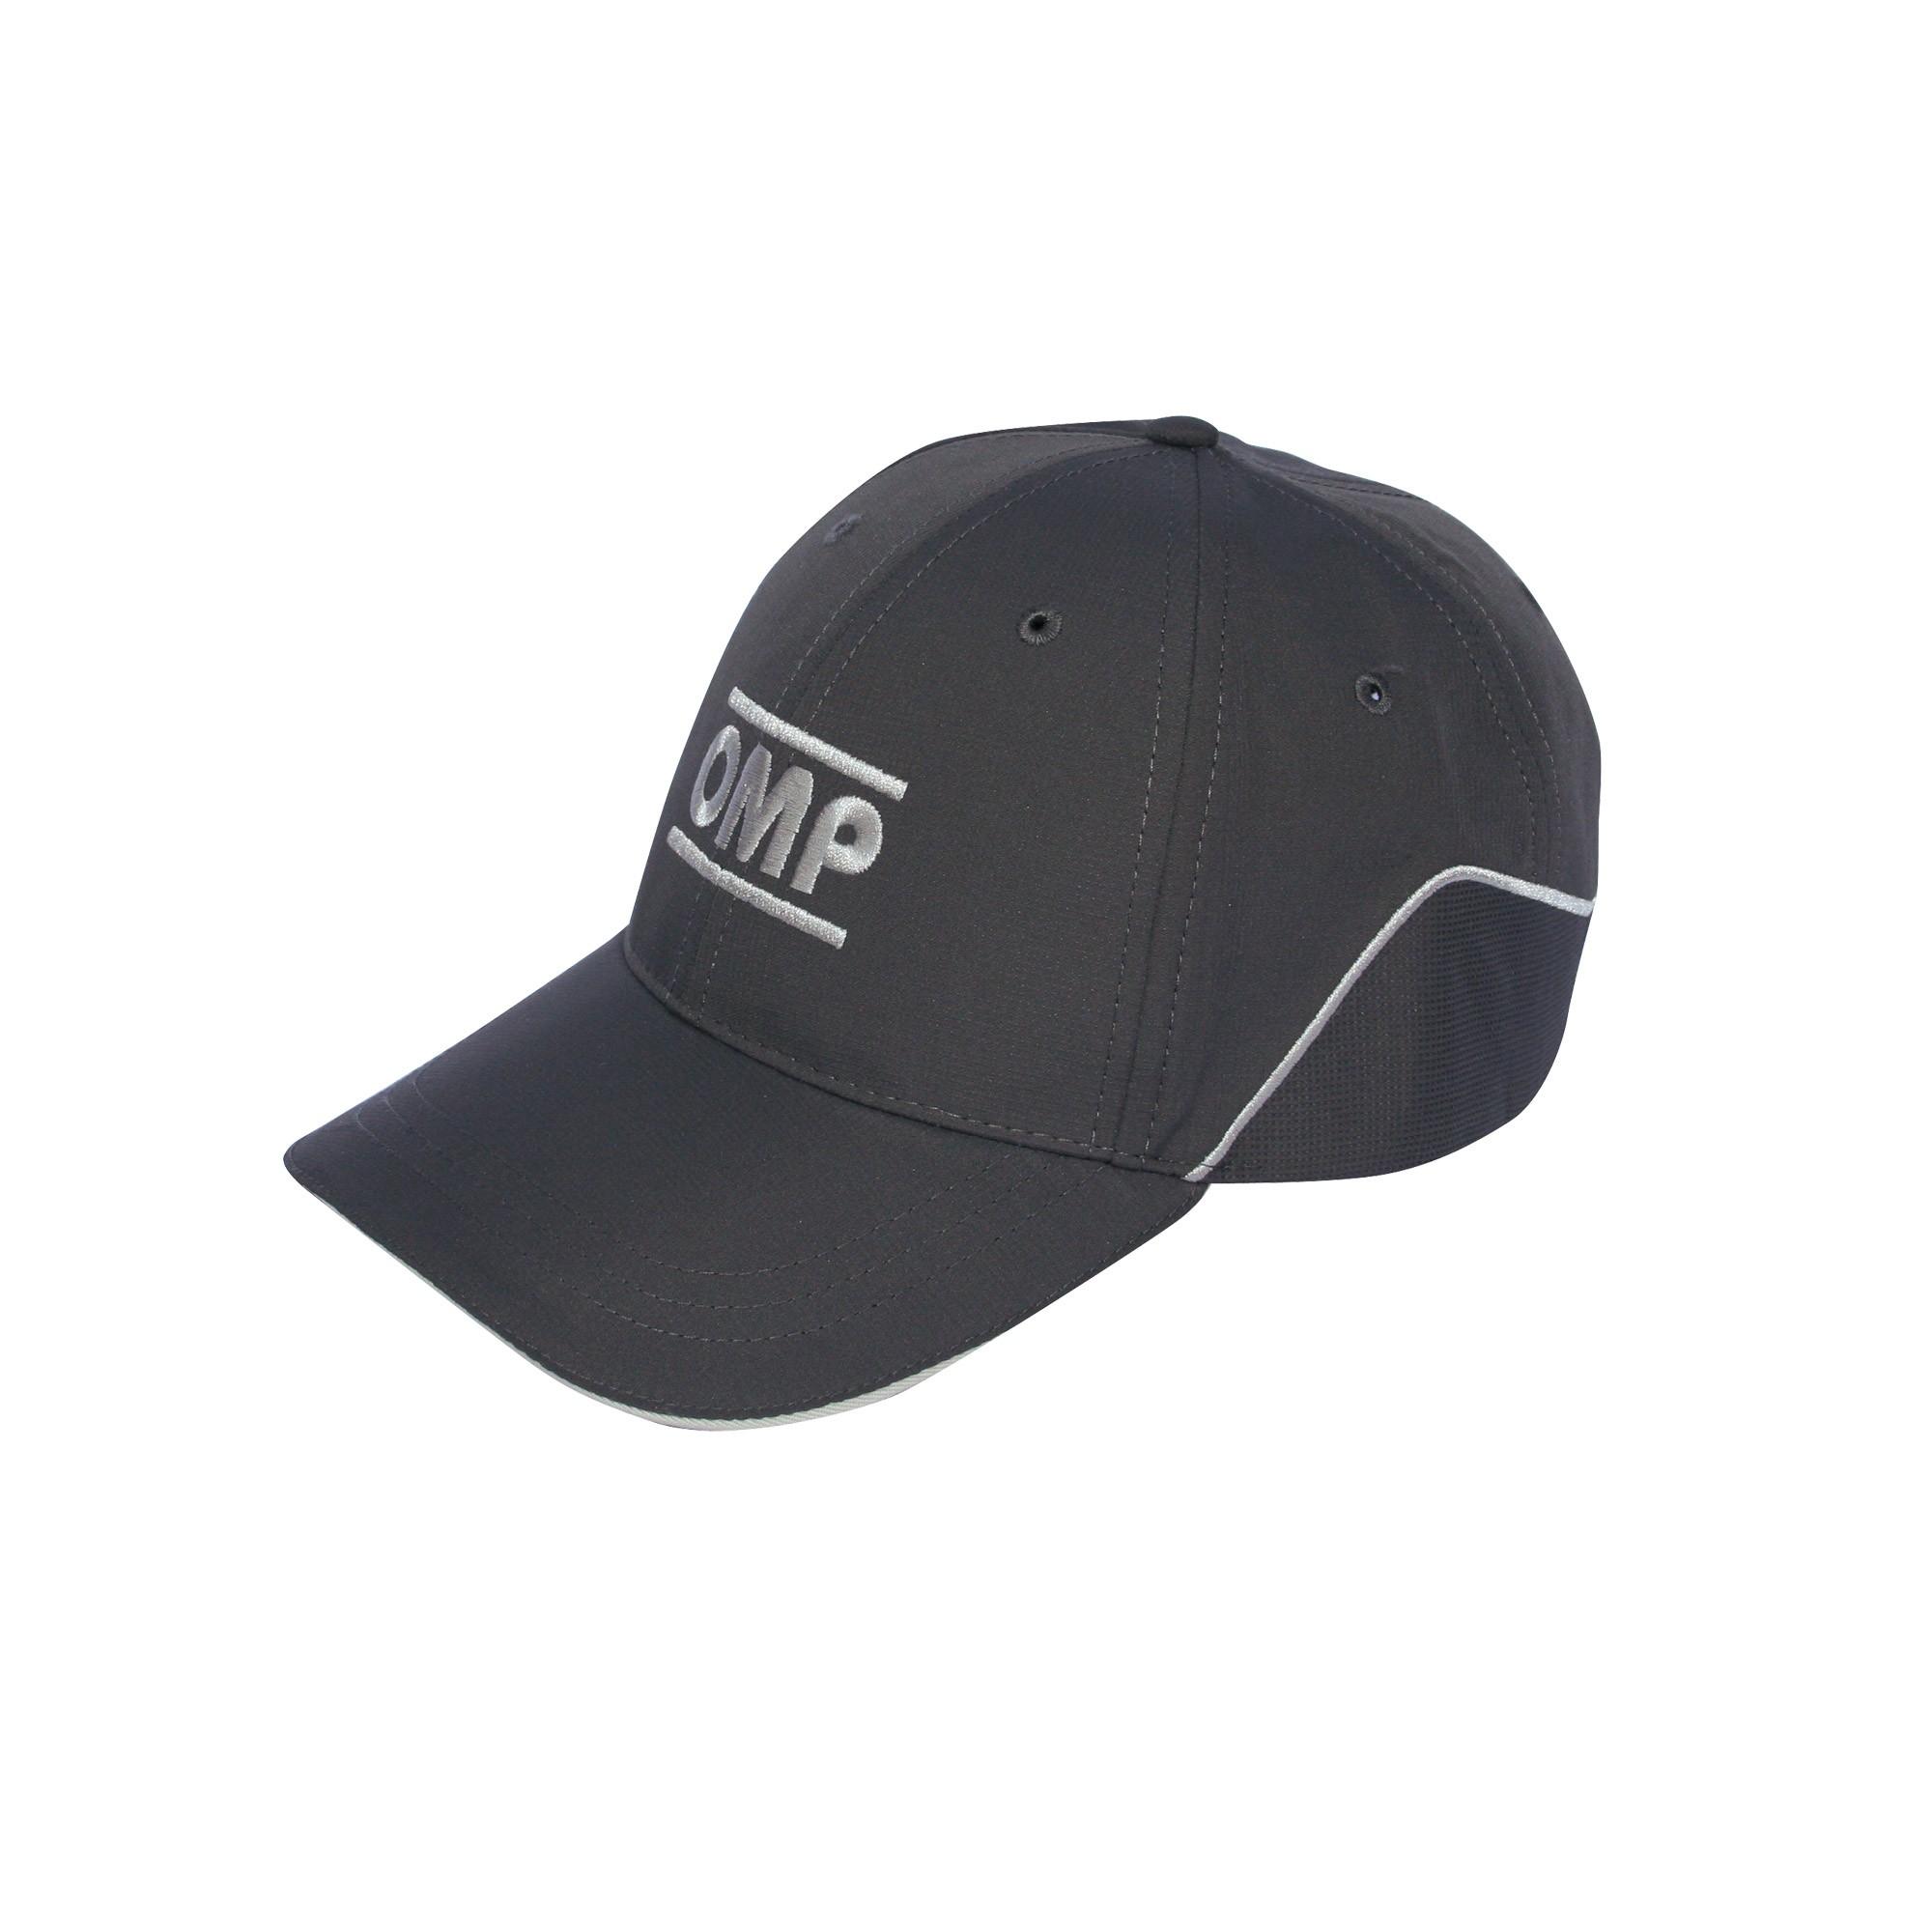 RACING SPIRIT CAP